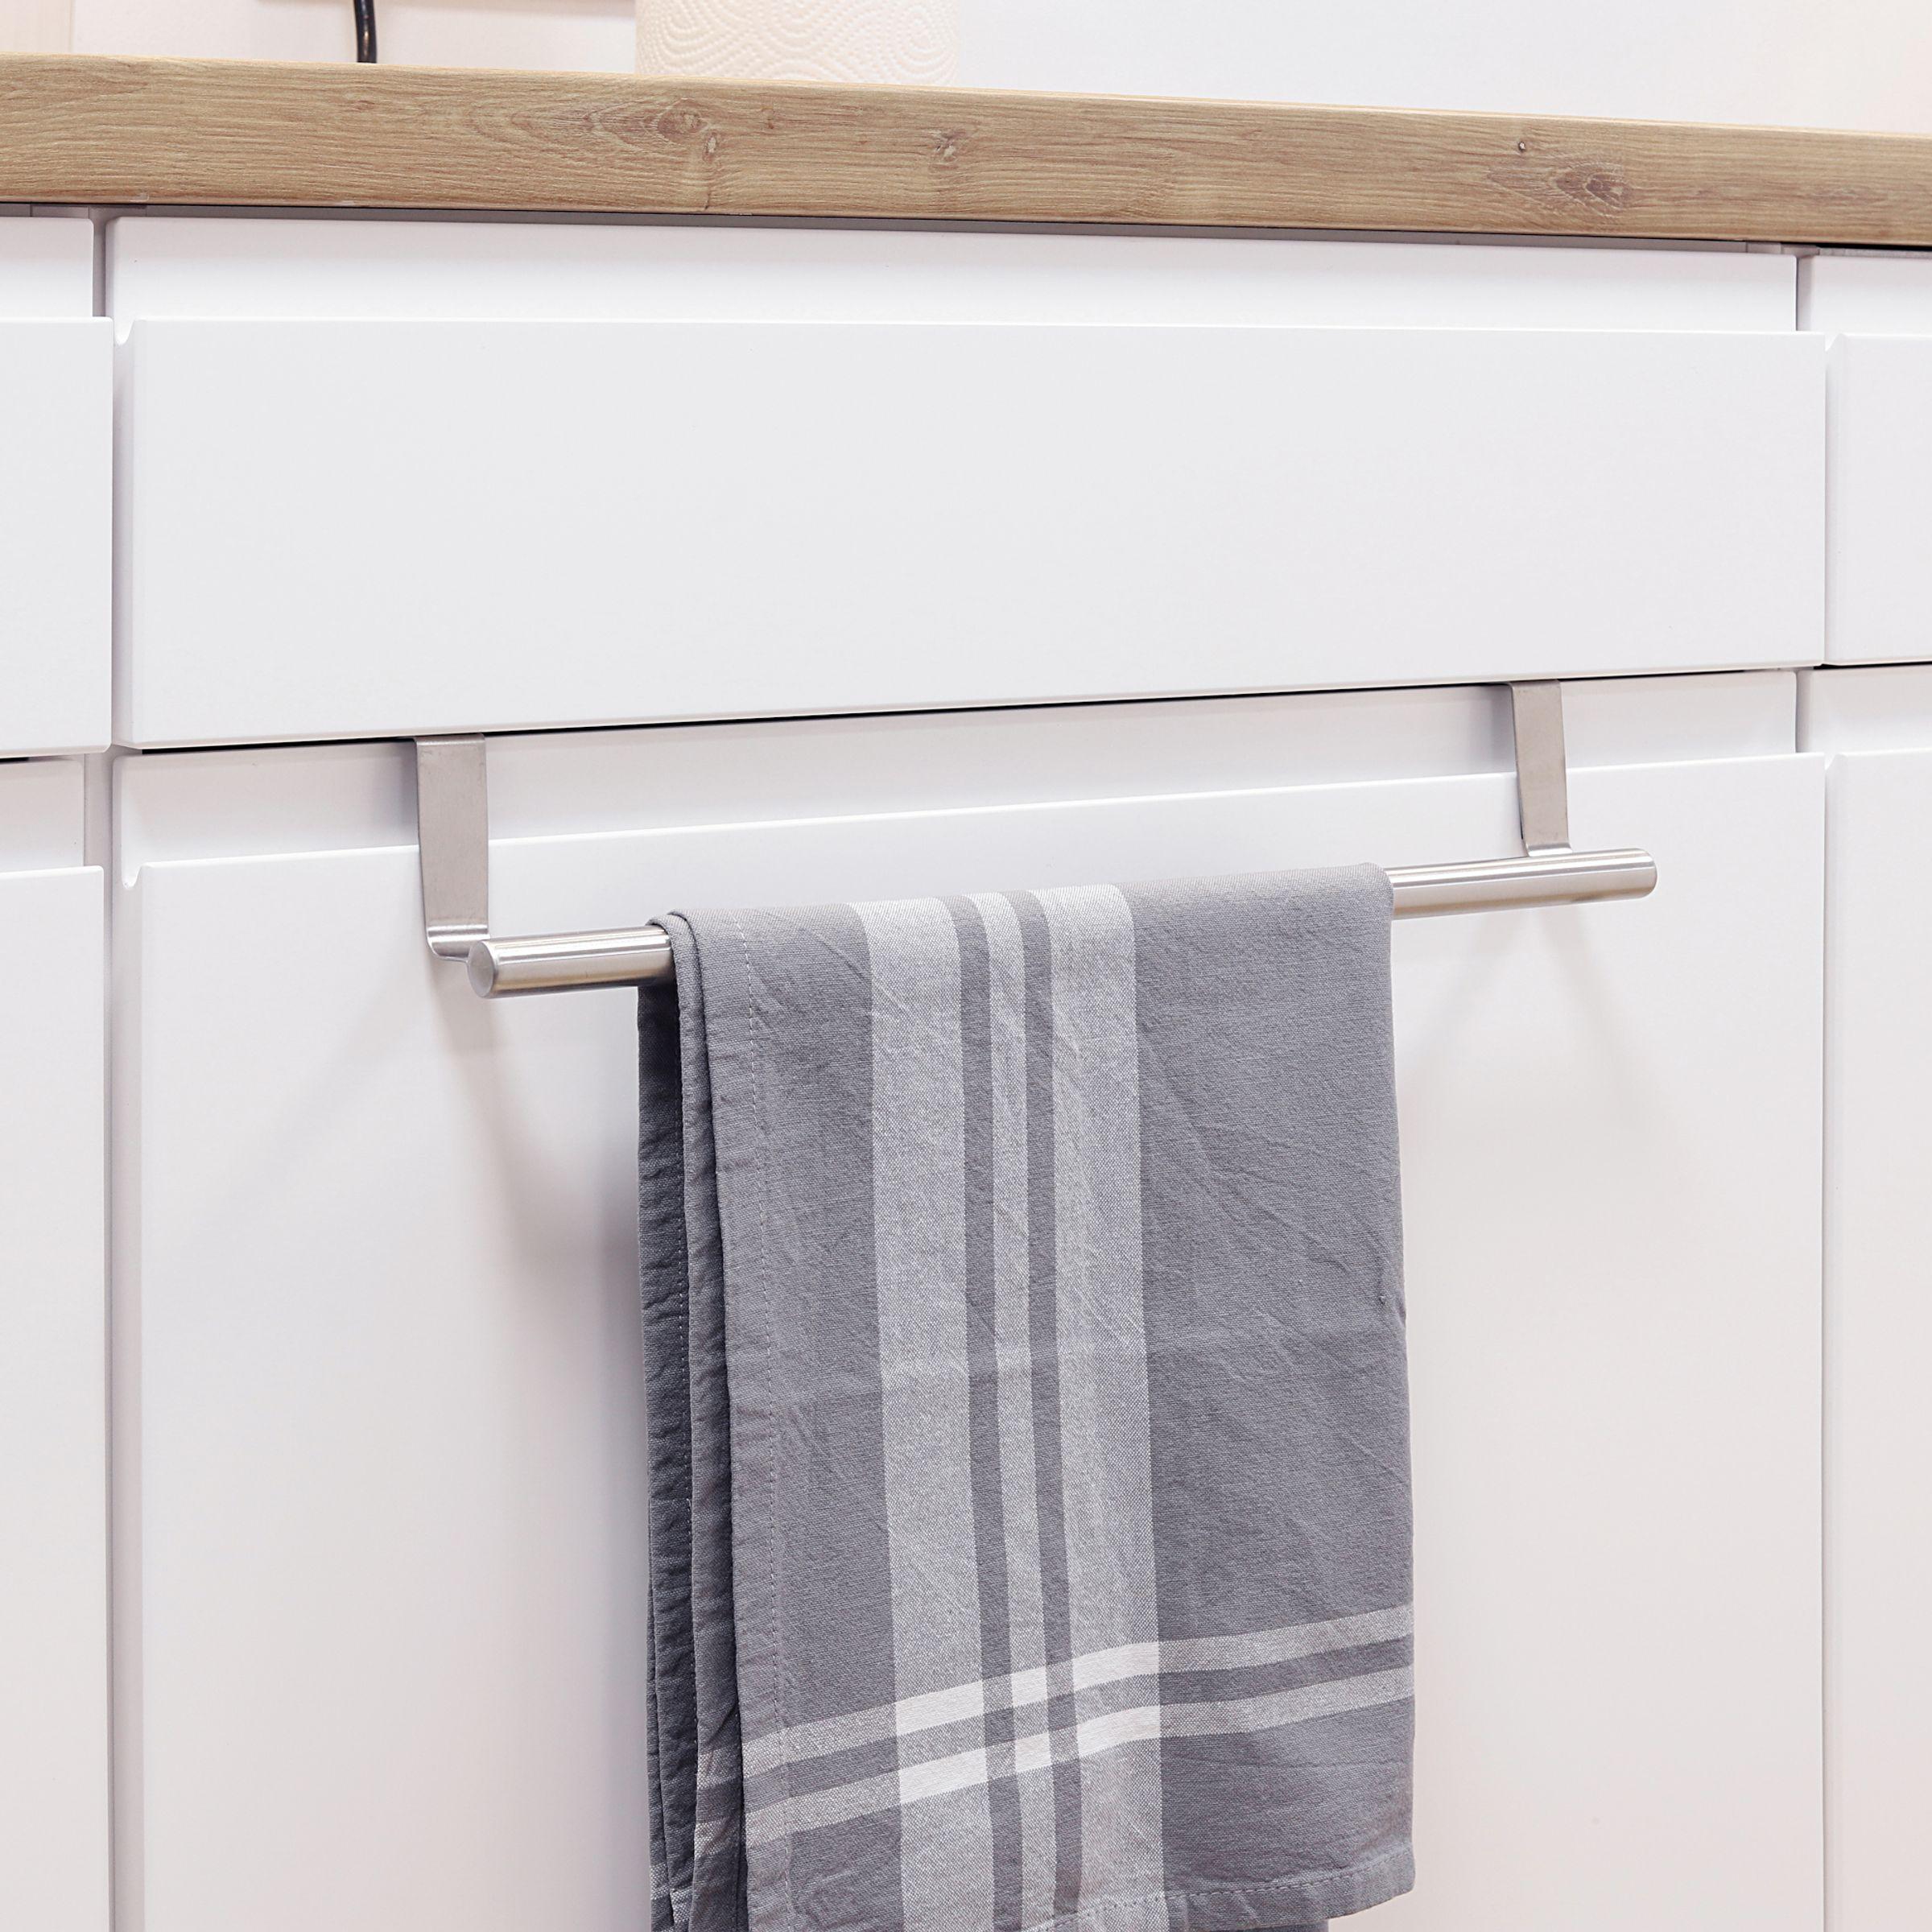 EDELSTAHL Handtuchhalter Handtuchstange Halter Handtuch